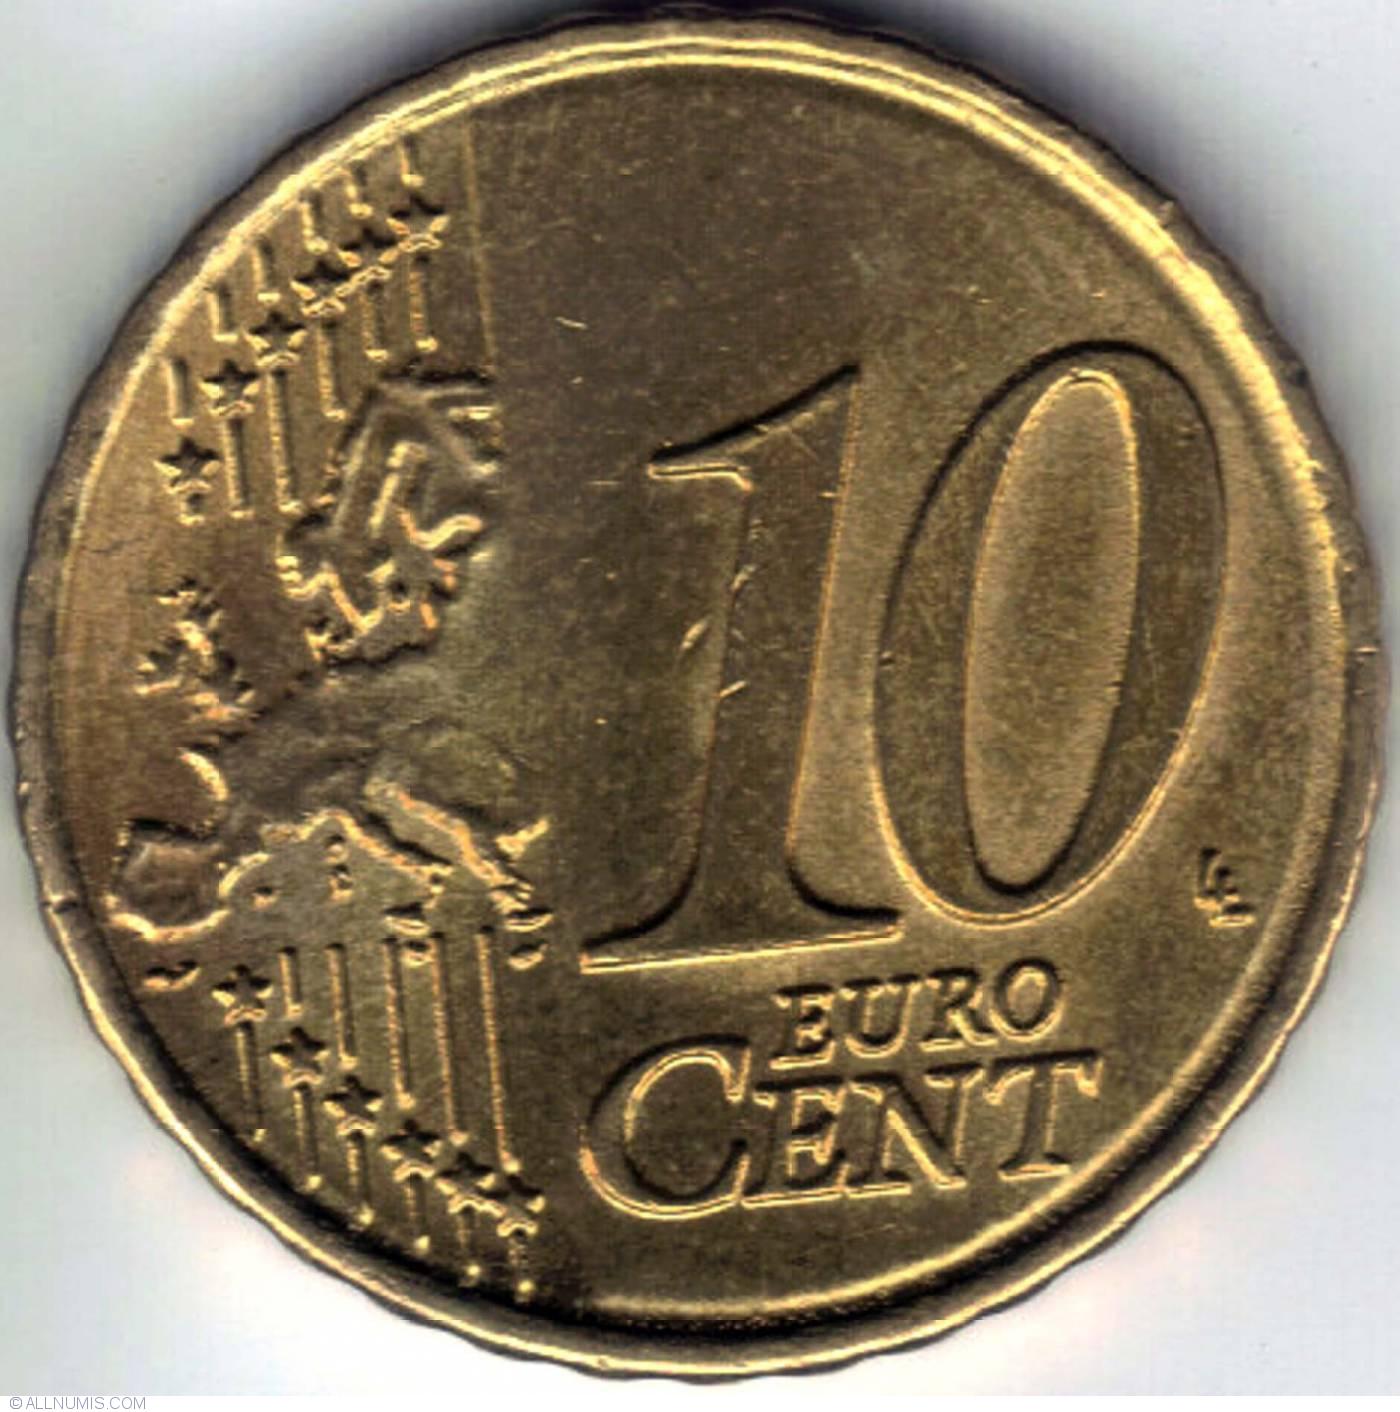 10 euro cent 2013 euro 2010 2019 france coin 32852. Black Bedroom Furniture Sets. Home Design Ideas